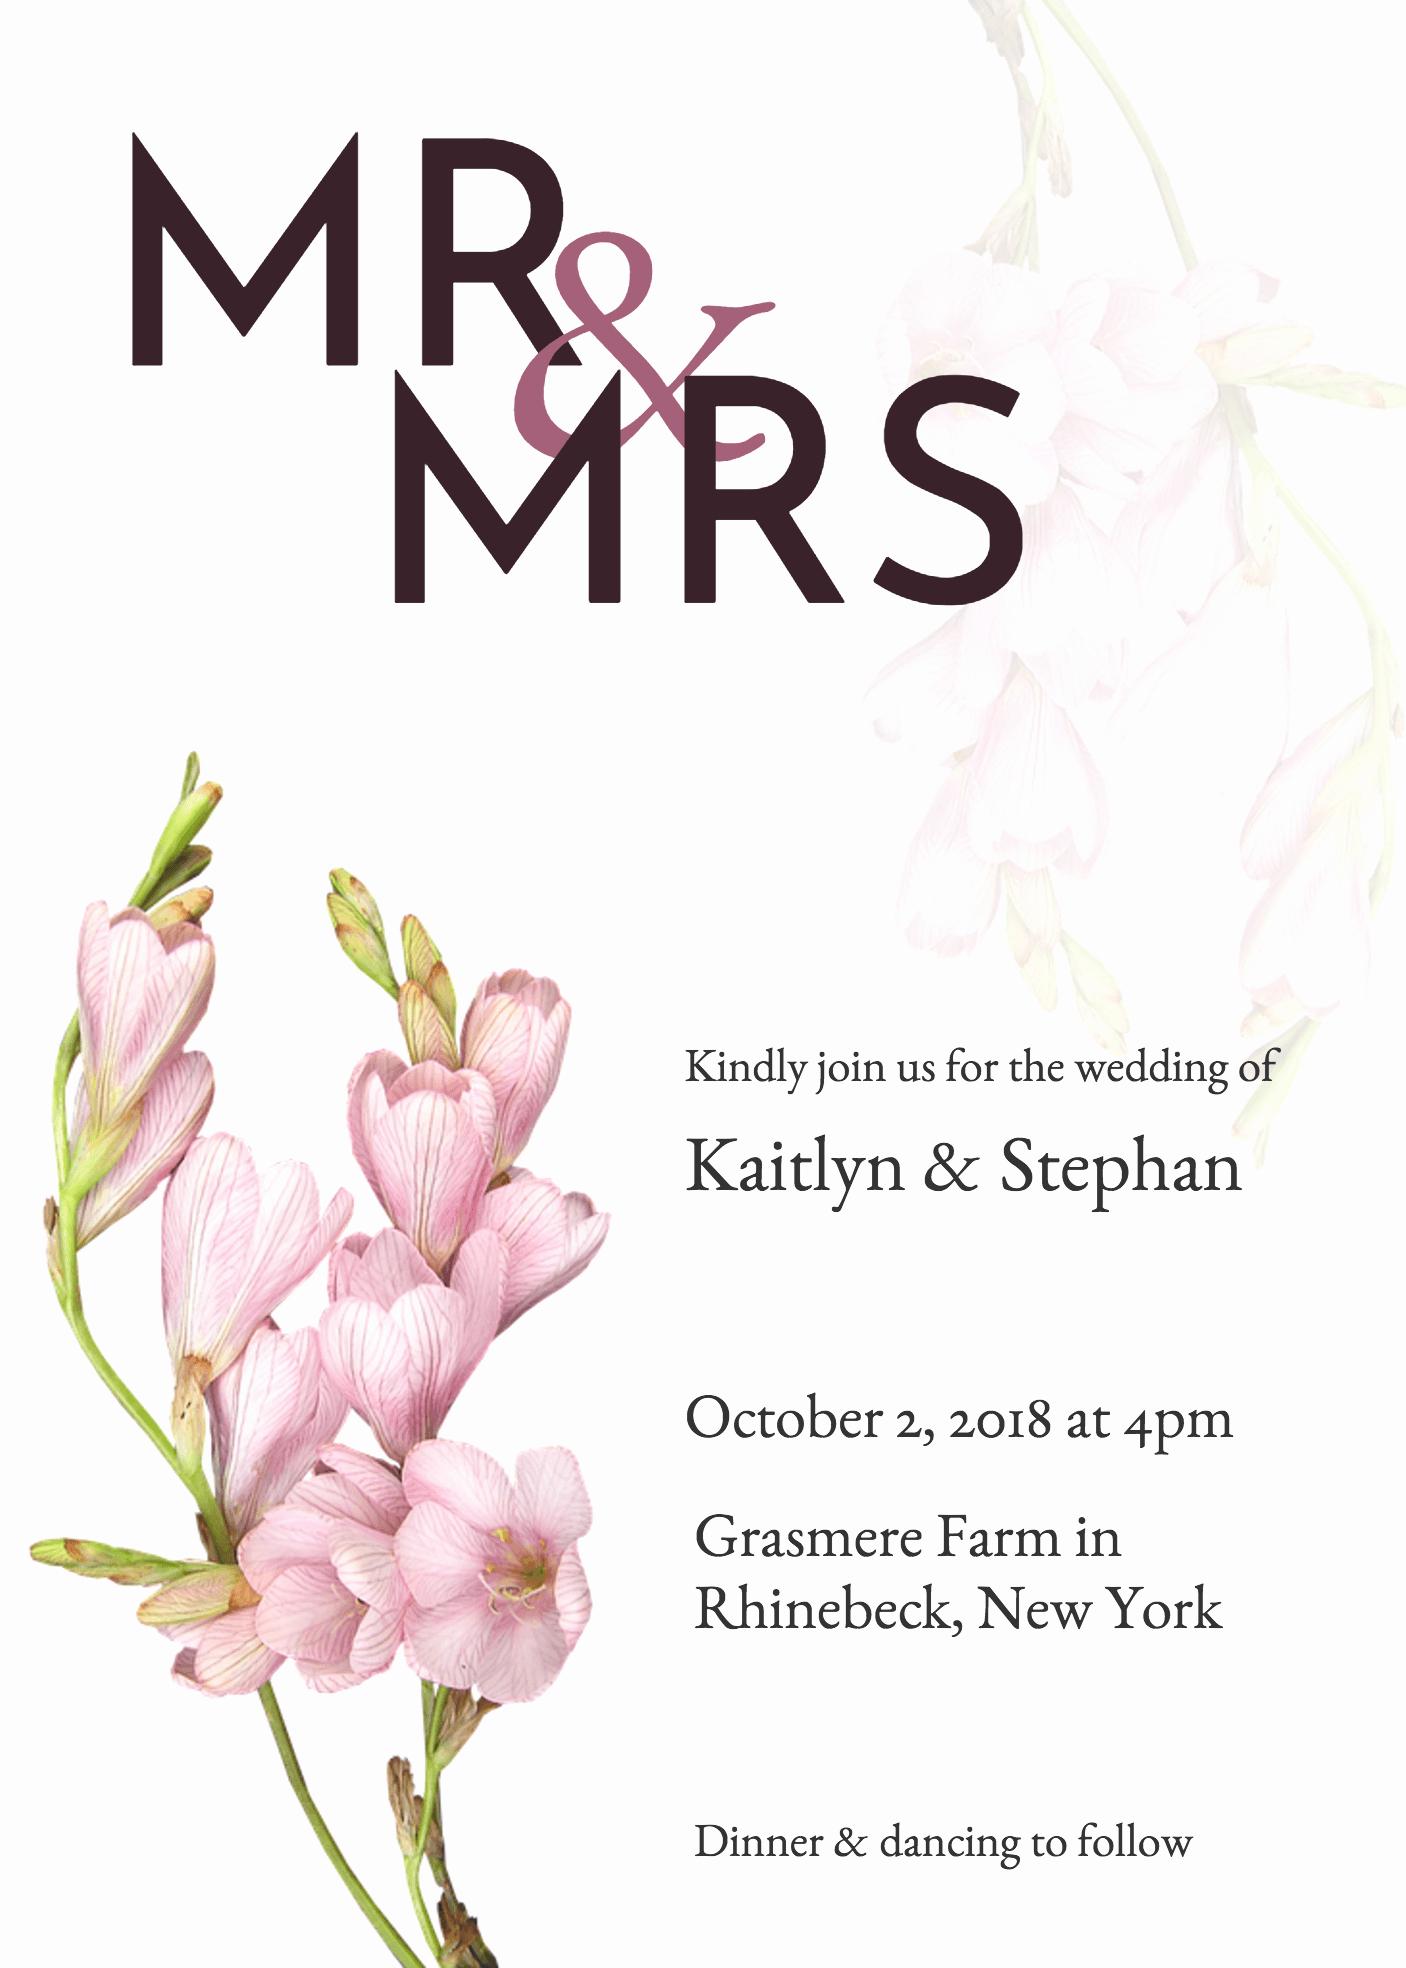 Bridal Shower Invitation Template Beautiful 19 Diy Bridal Shower and Wedding Invitation Templates